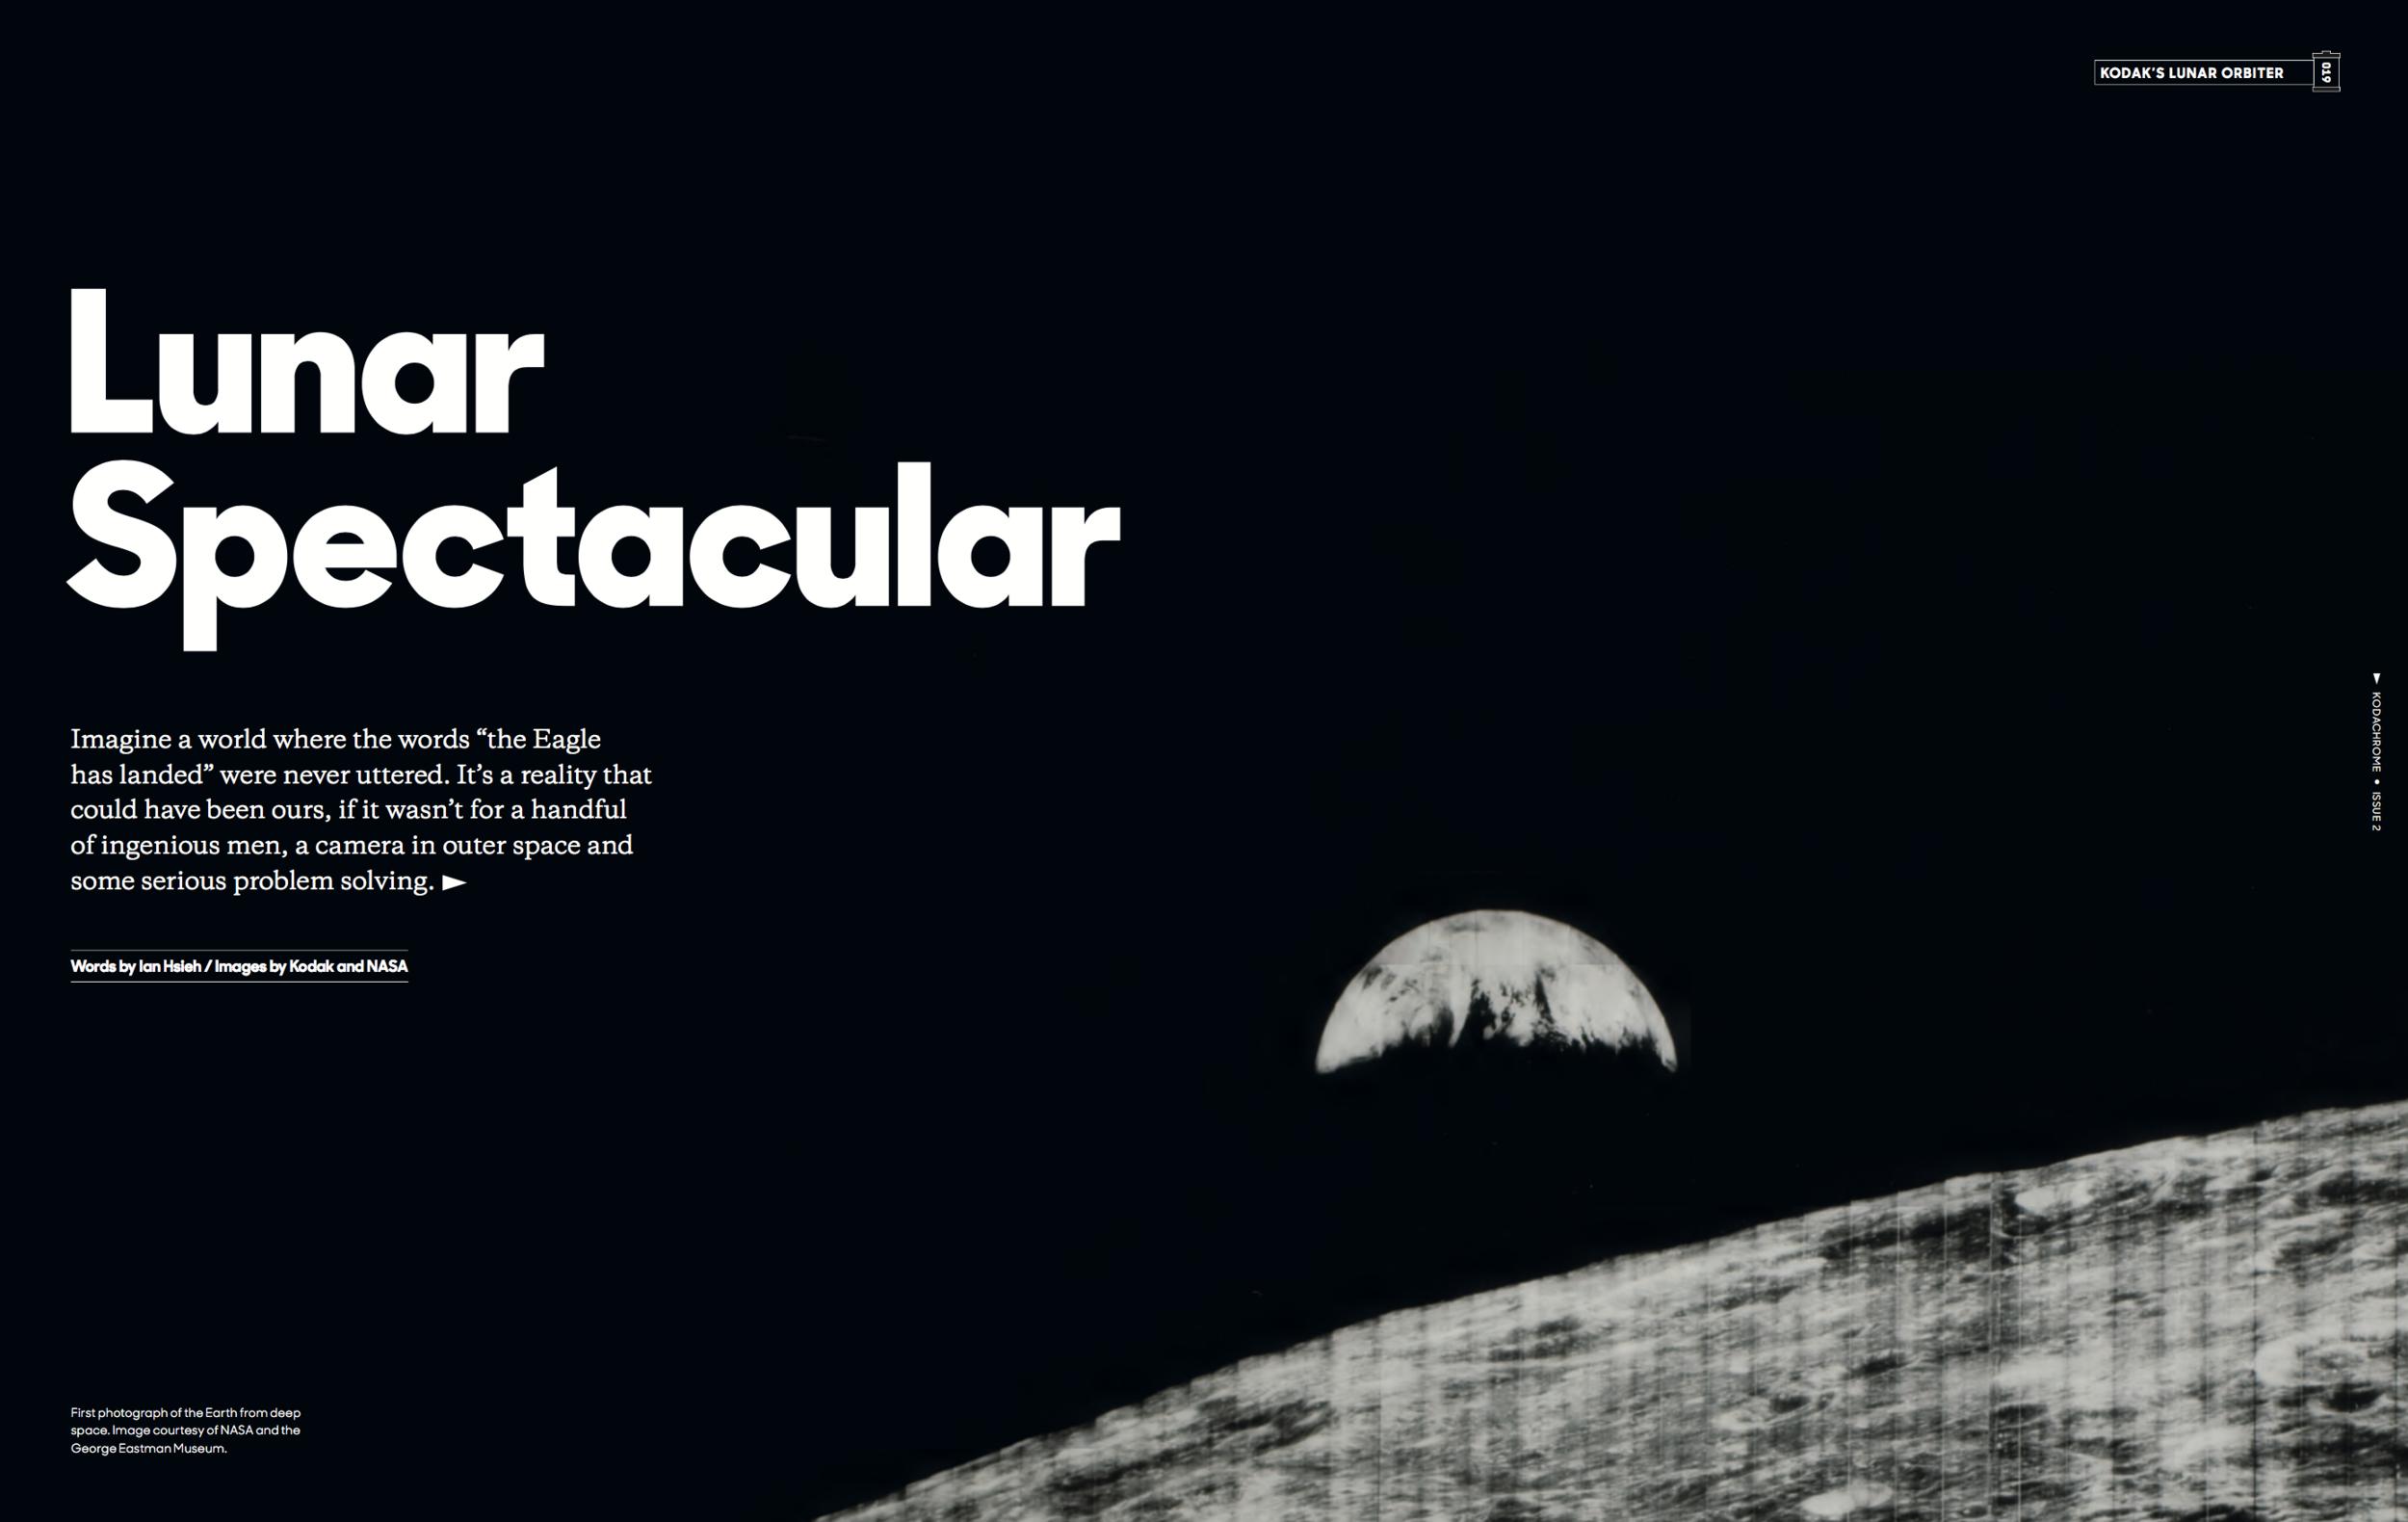 Lunar Spectacular_p1.jpg